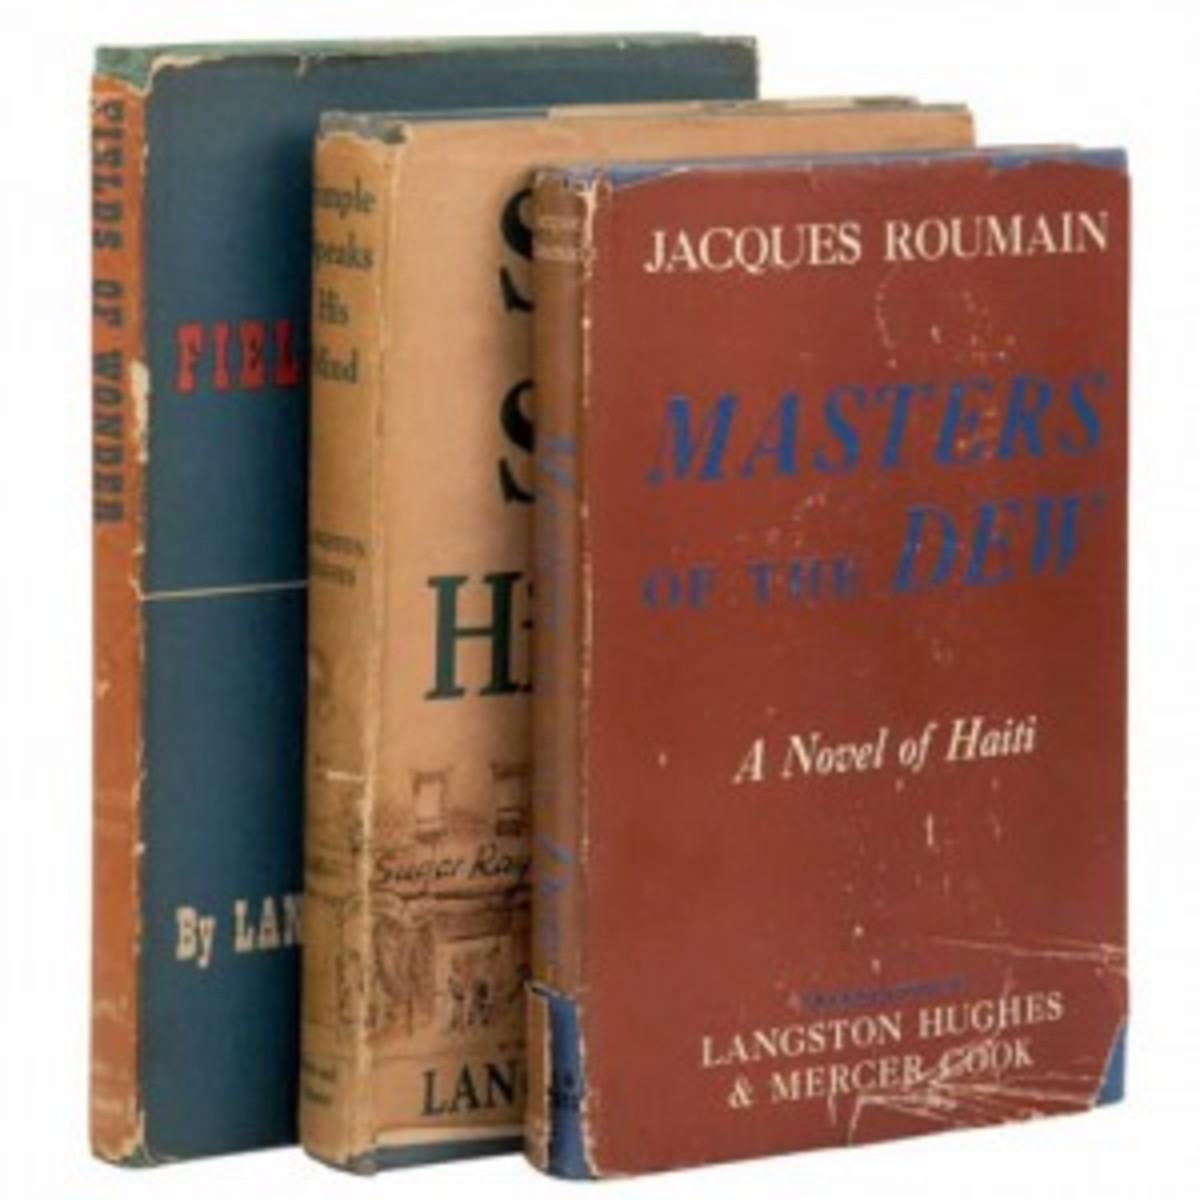 Langston Hughes Books